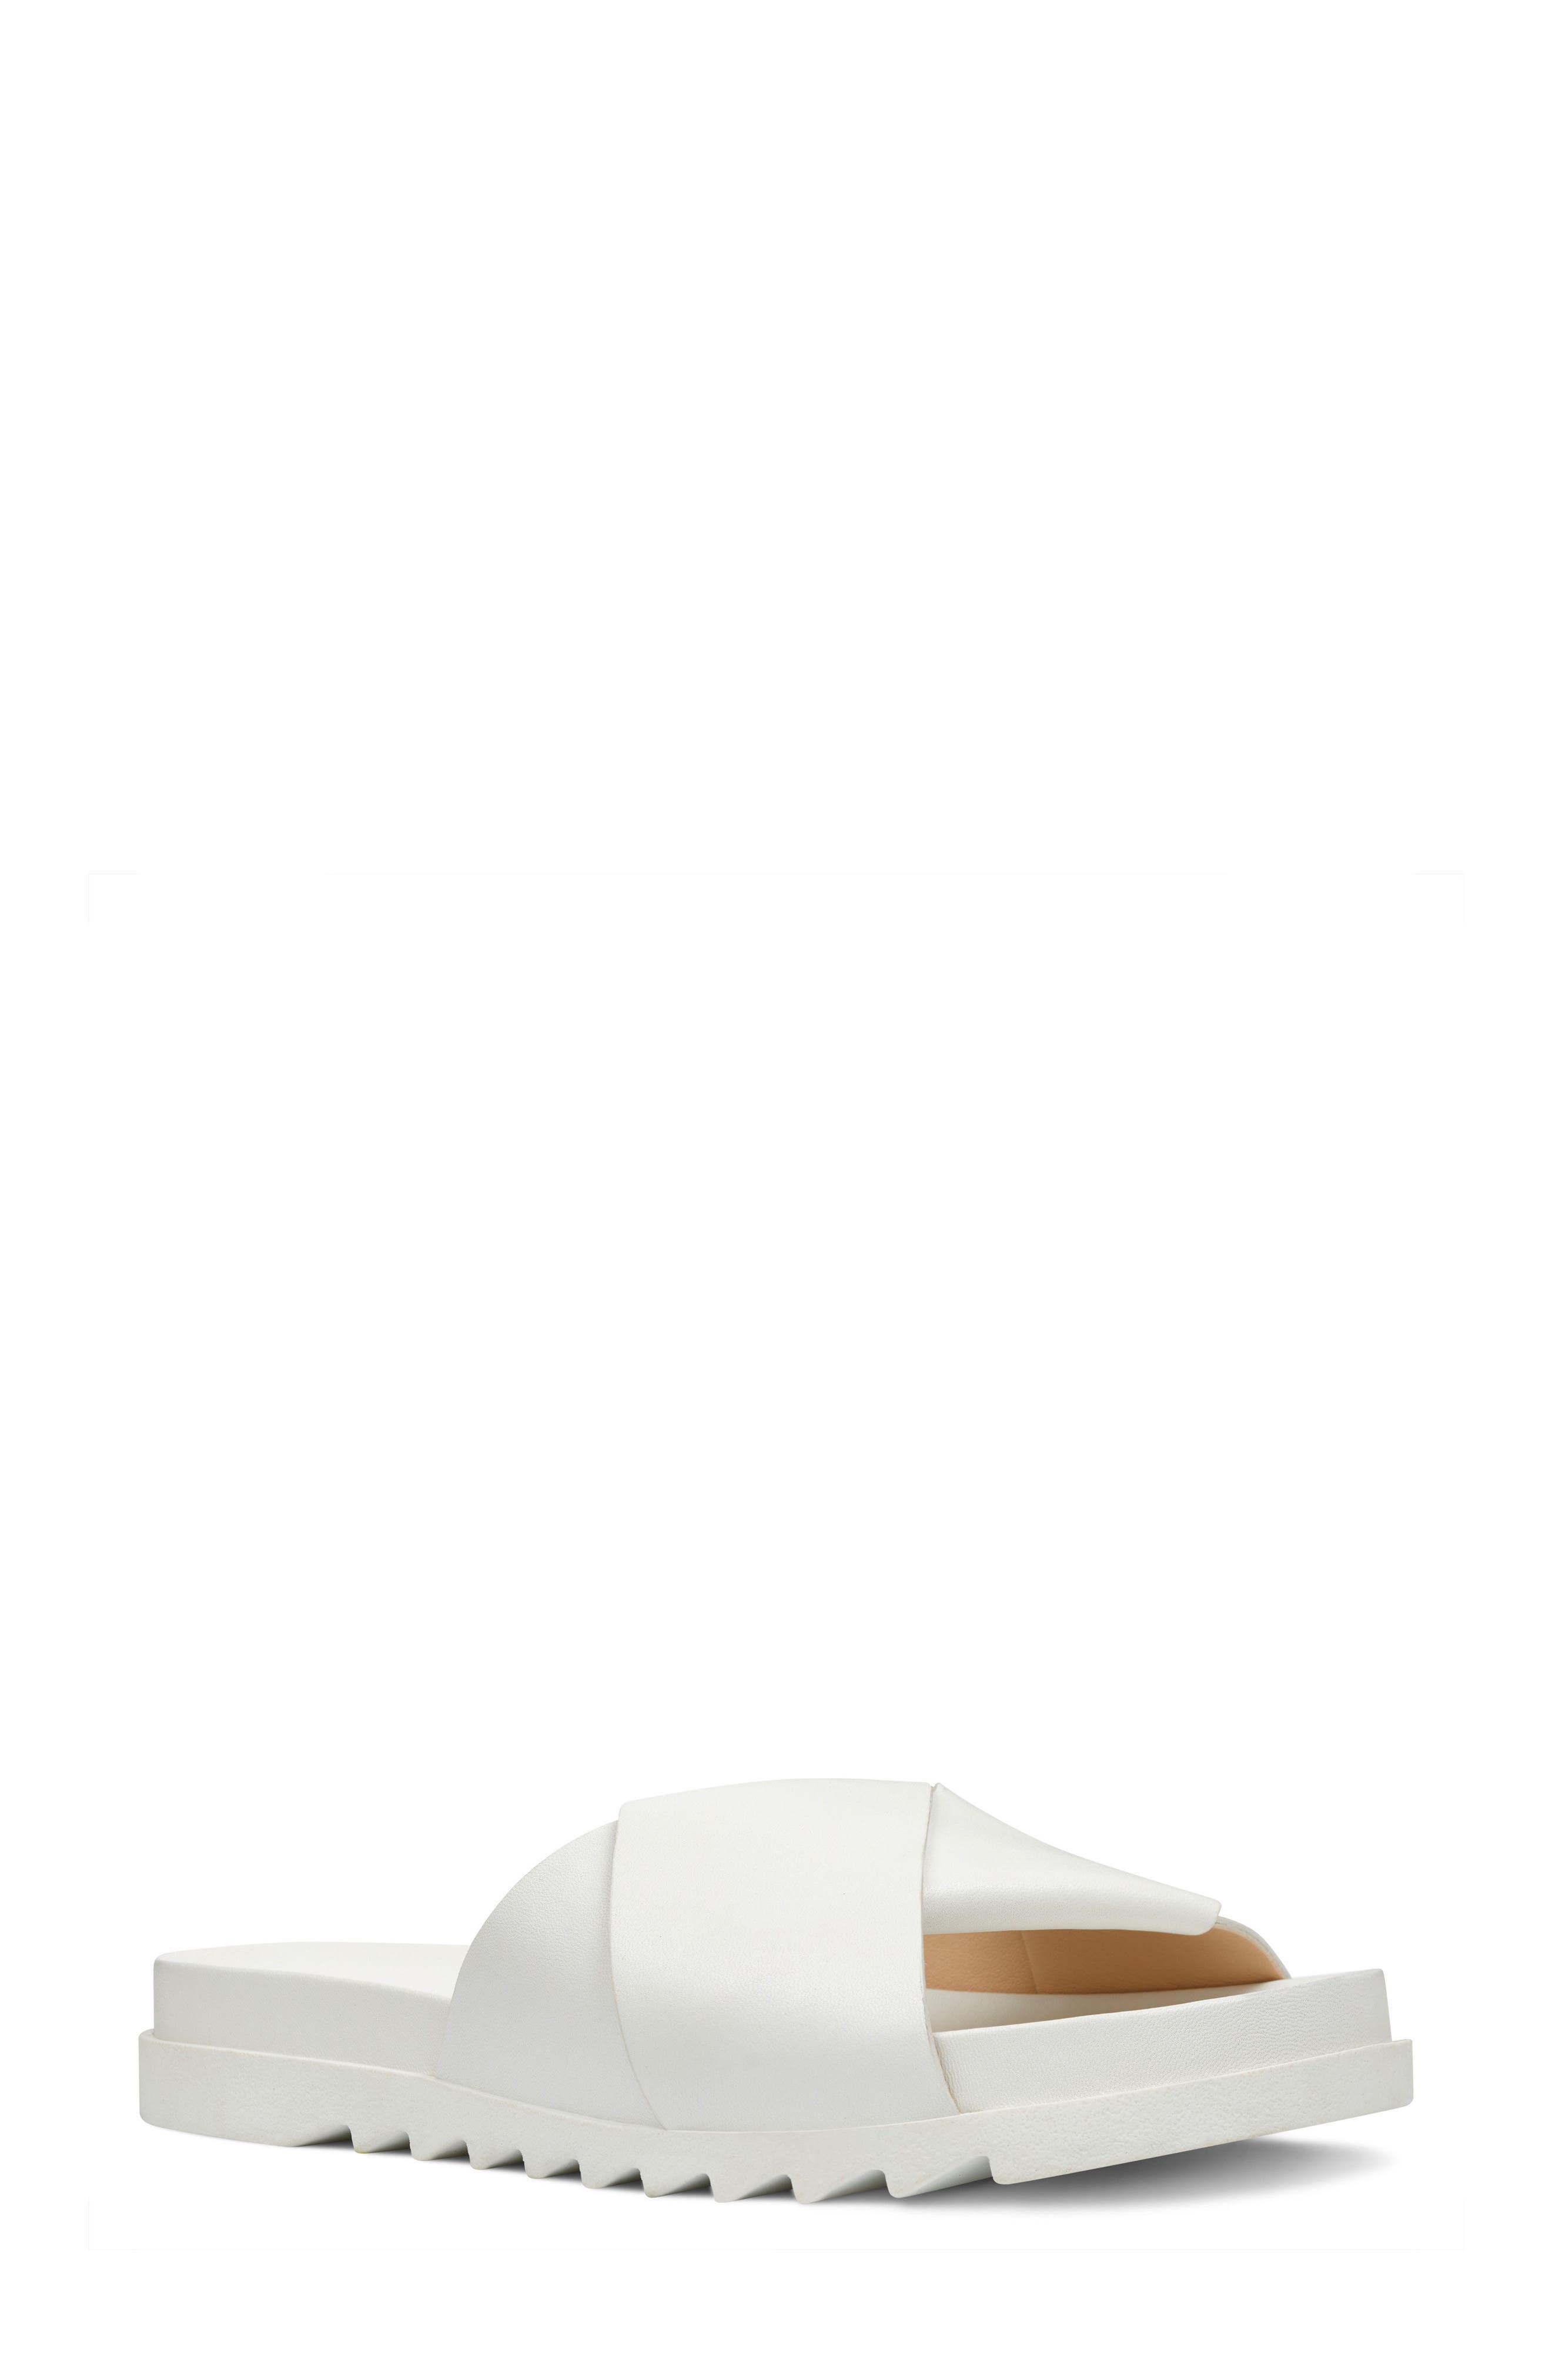 Furaish Slide Sandal,                         Main,                         color, White Leather